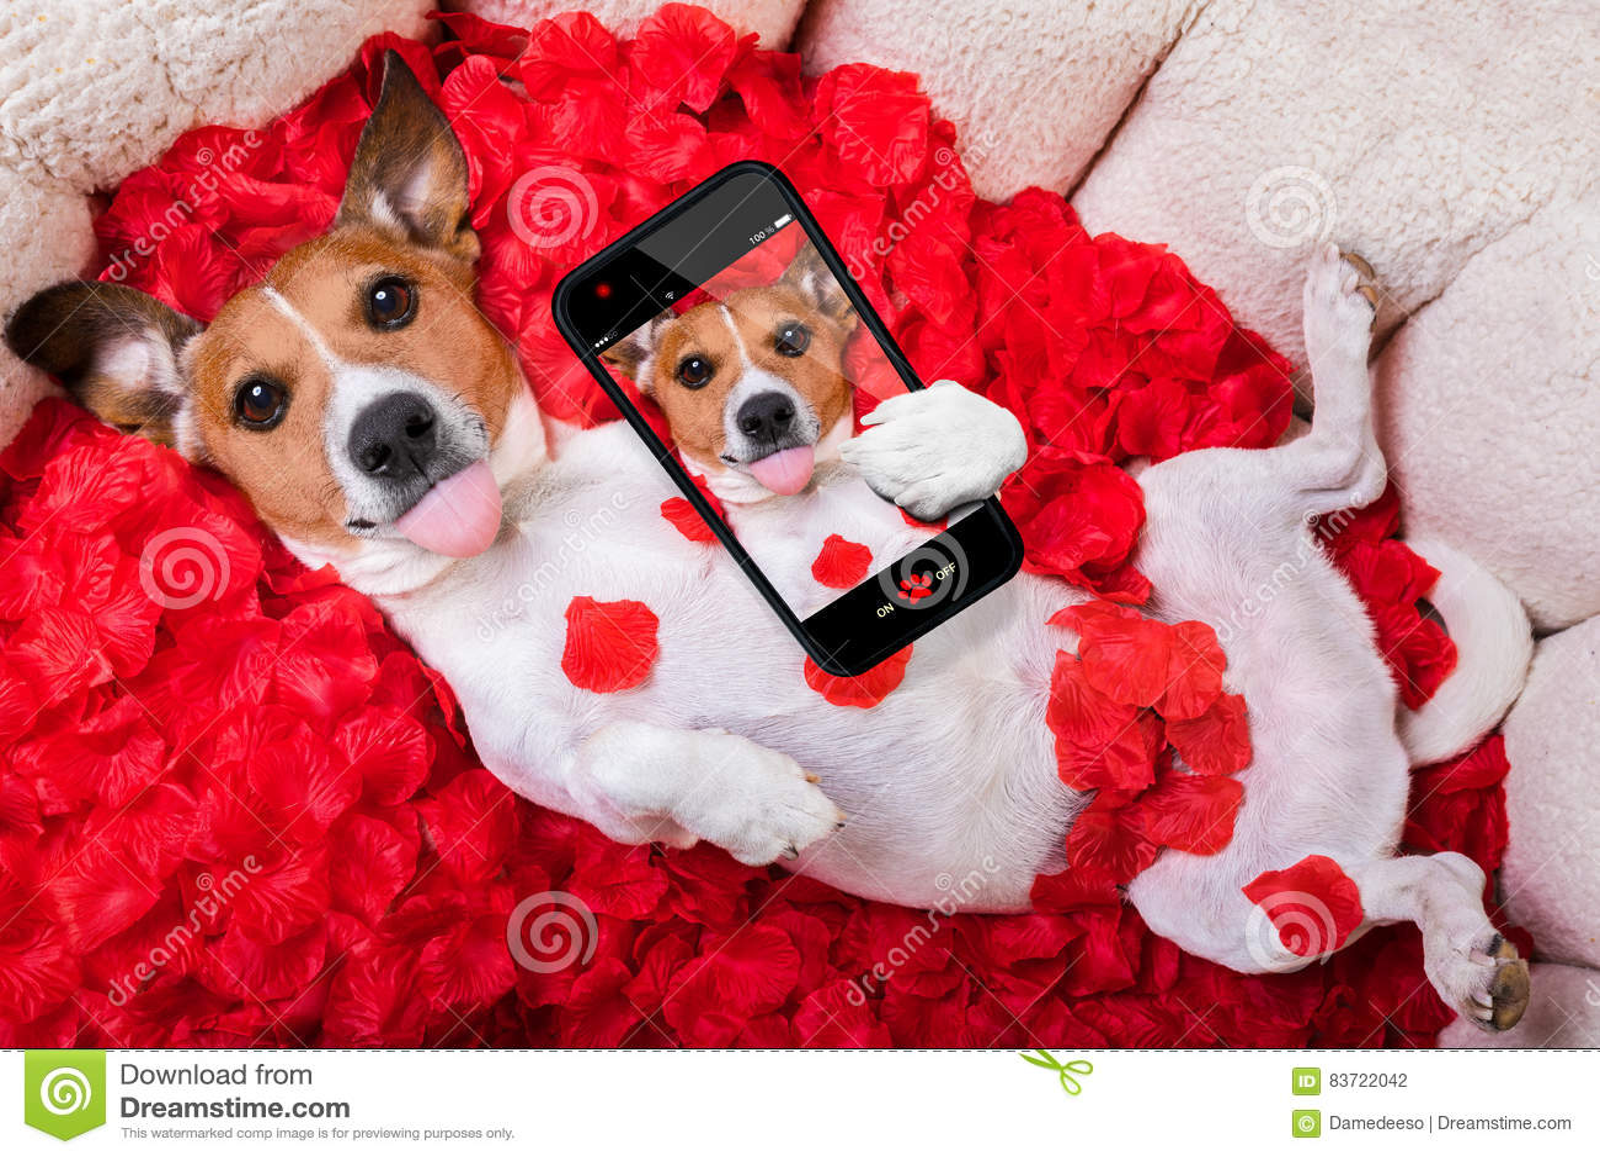 Dog Love Rose Valentines Selfie Stock Photo